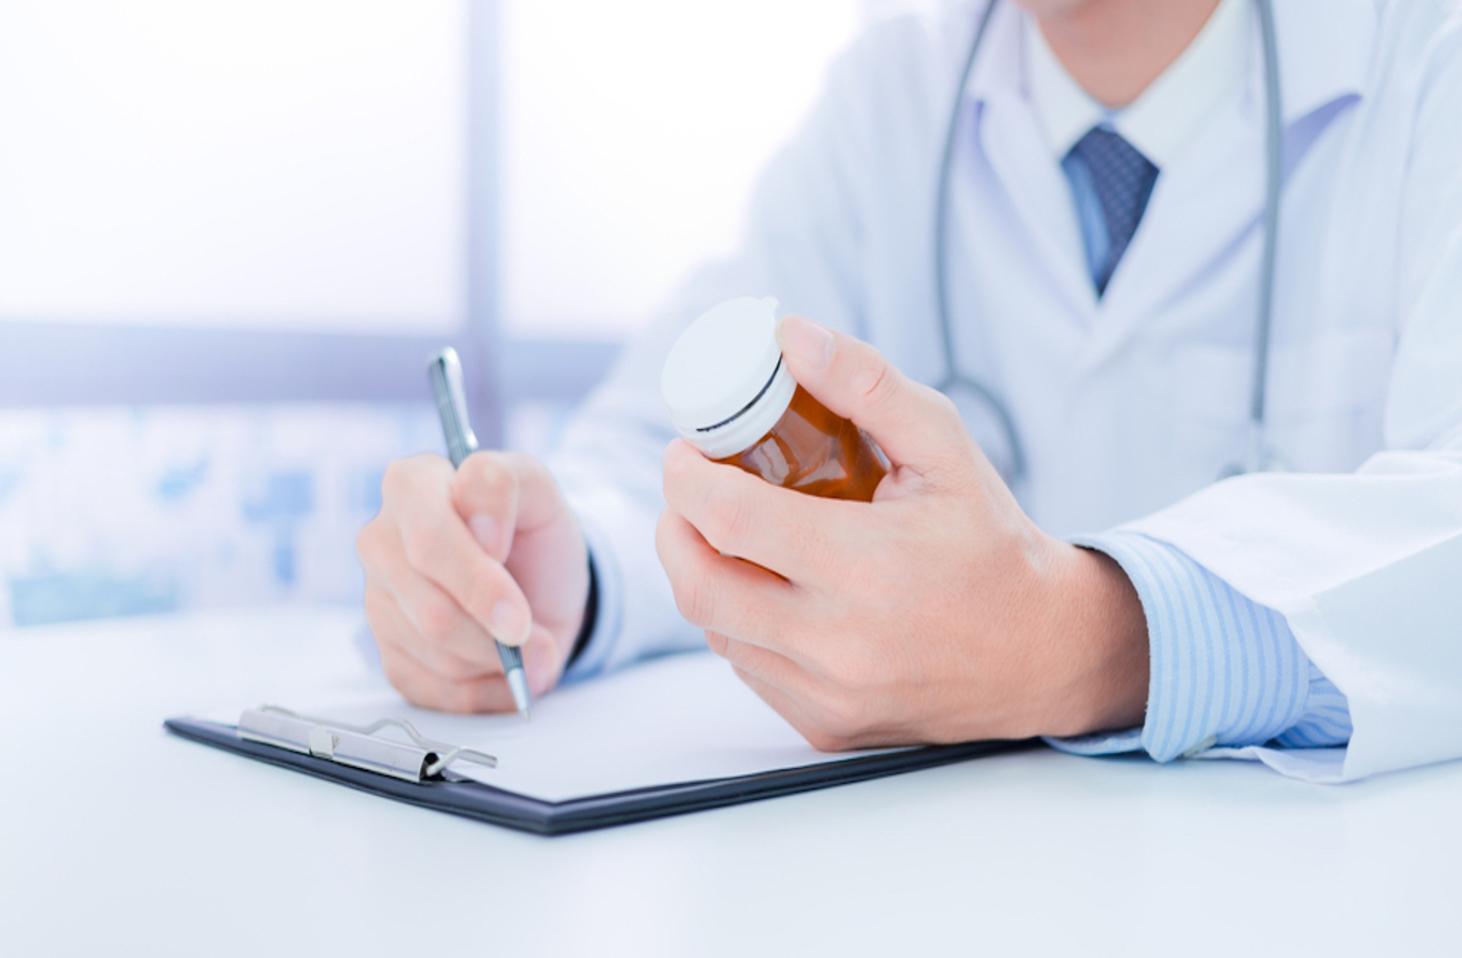 Person in lab coat researching a prescription